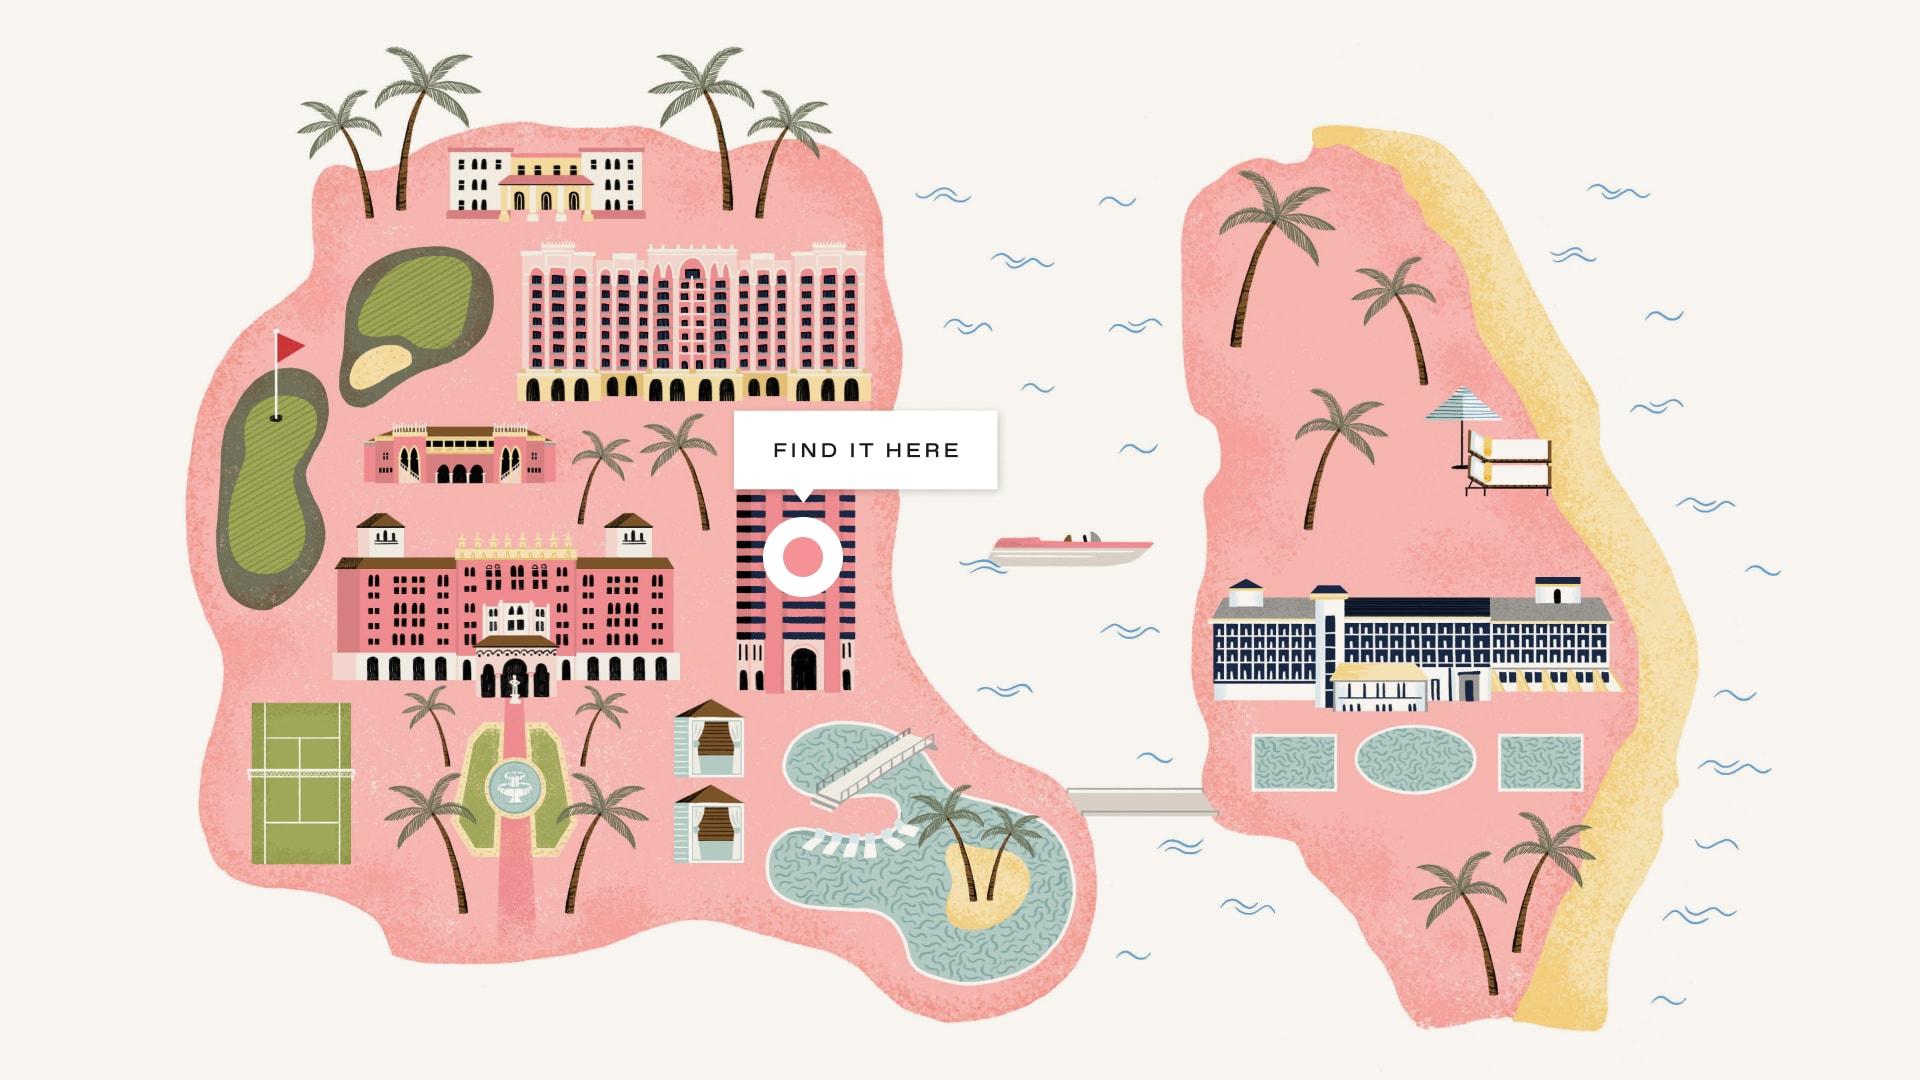 Map of the Boca Raton Resort